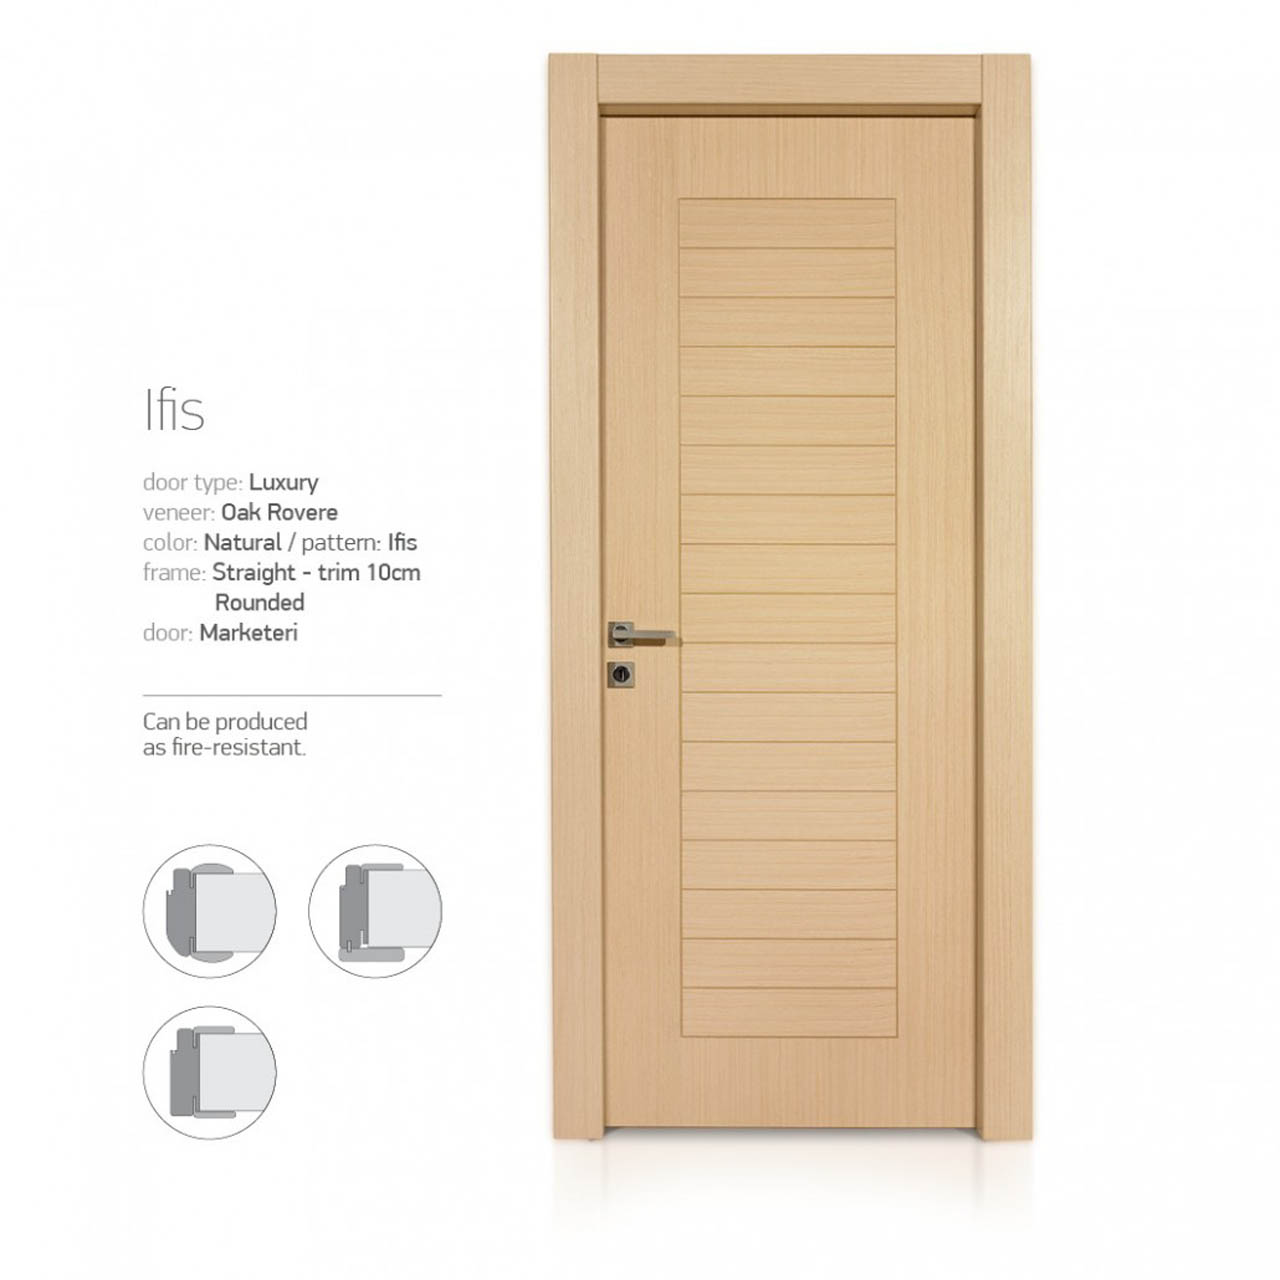 portes-site-luxury-eng18-1030x1030